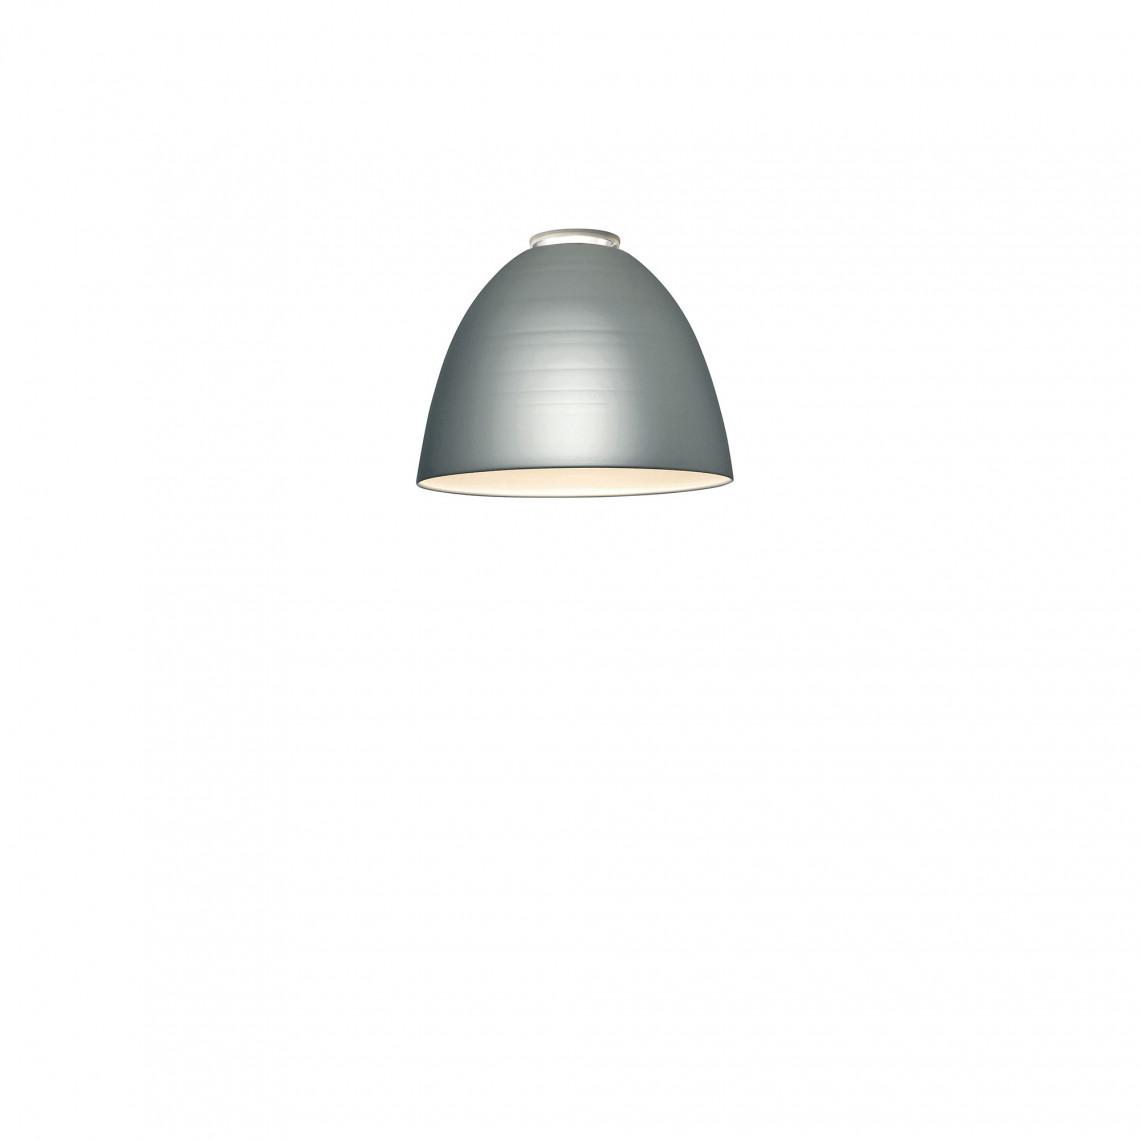 Nur Mini Taklampa Aluminiumgrå